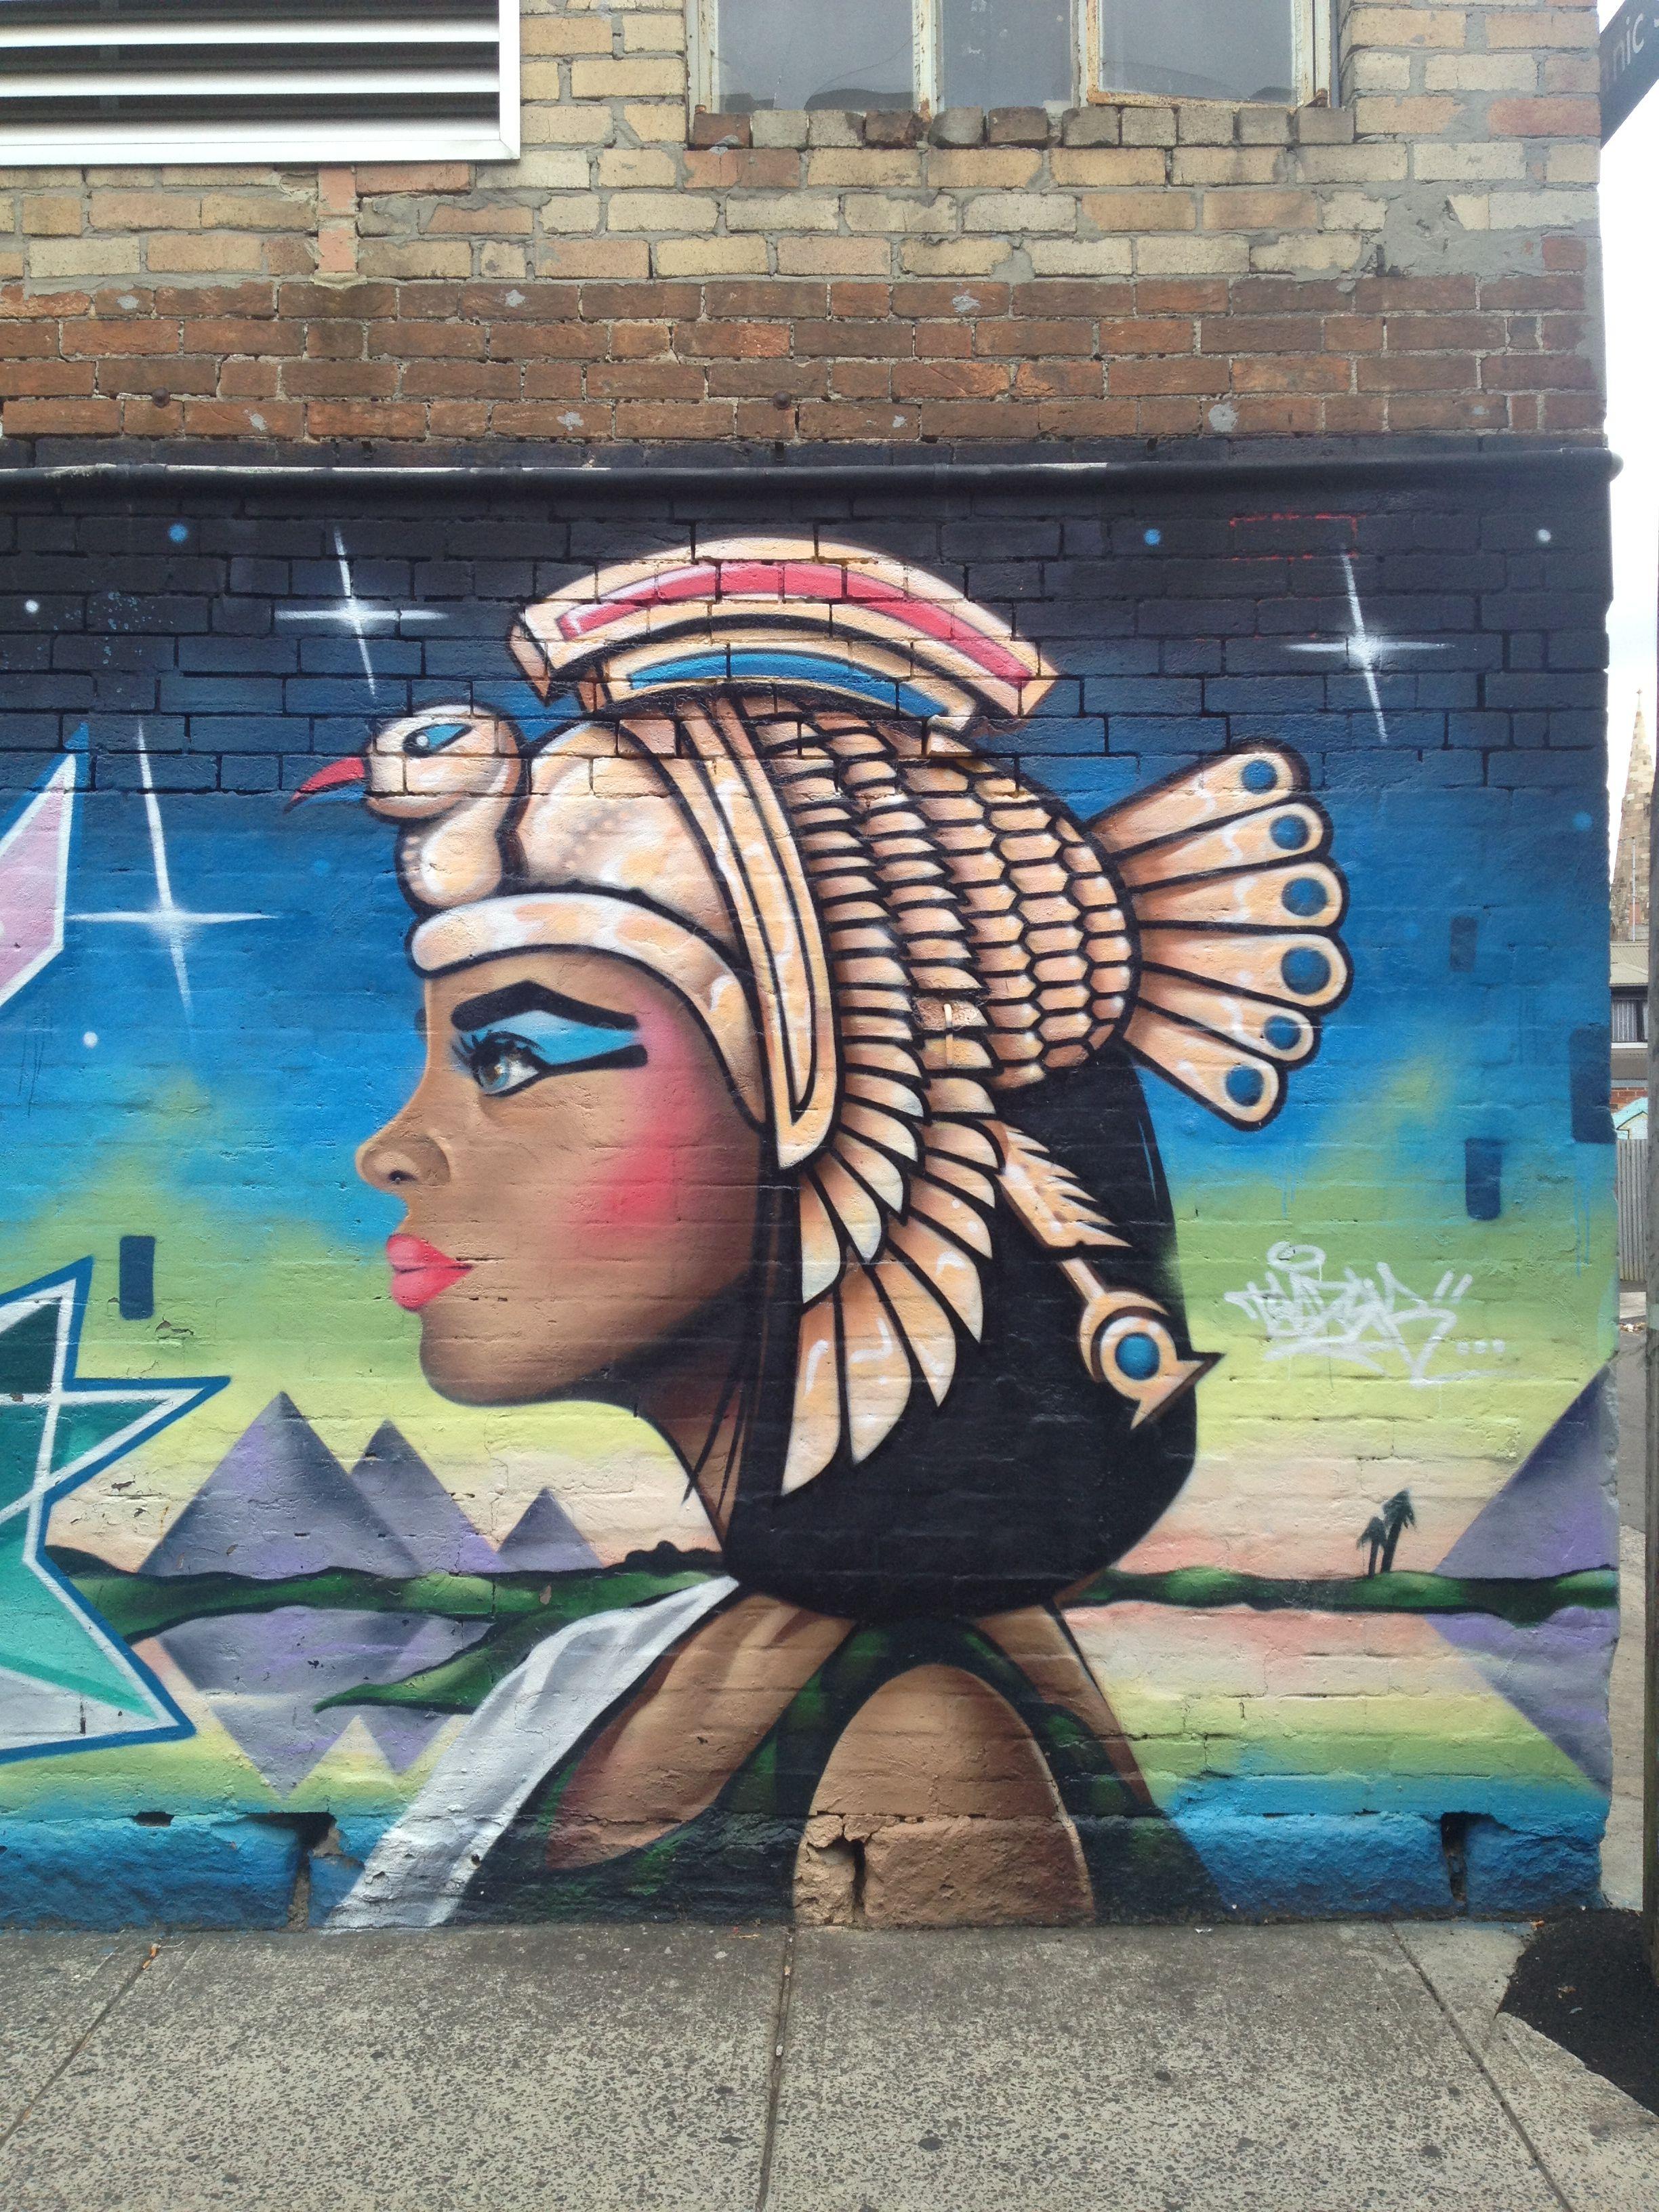 Nsw newtown sydney 3d street art street art graffiti